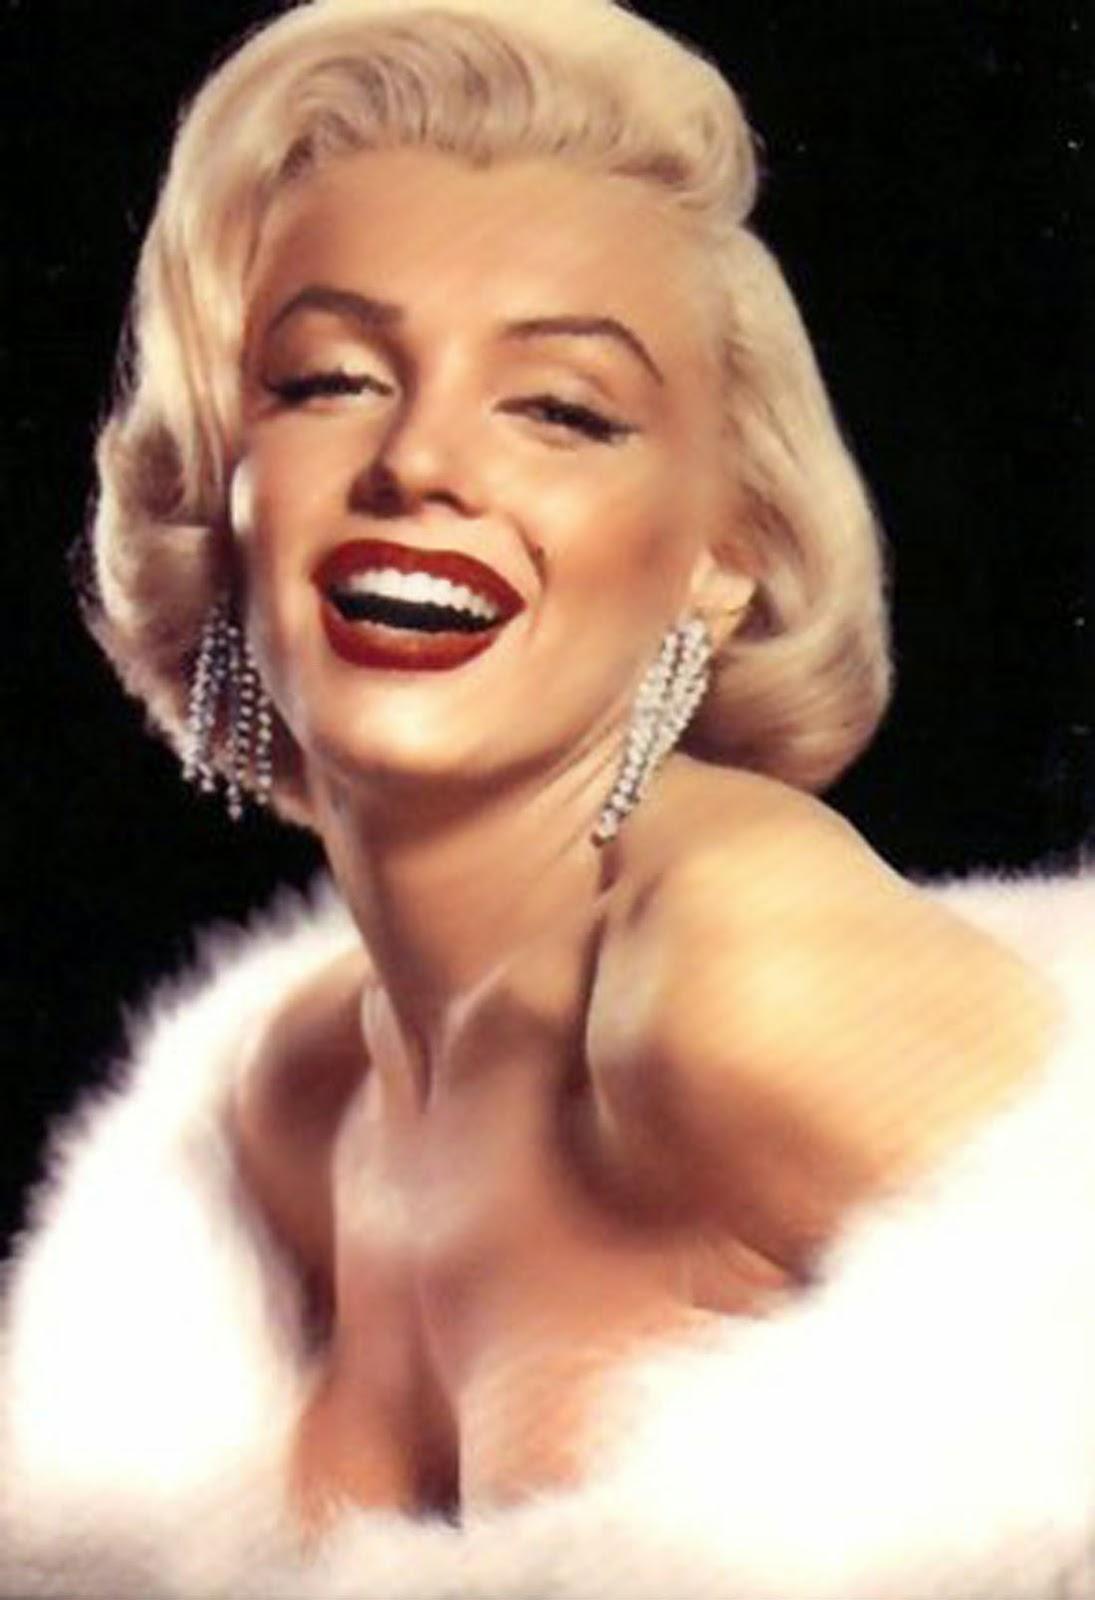 Make Up Fashion Hair Do And More 1930 1950 S Make Up